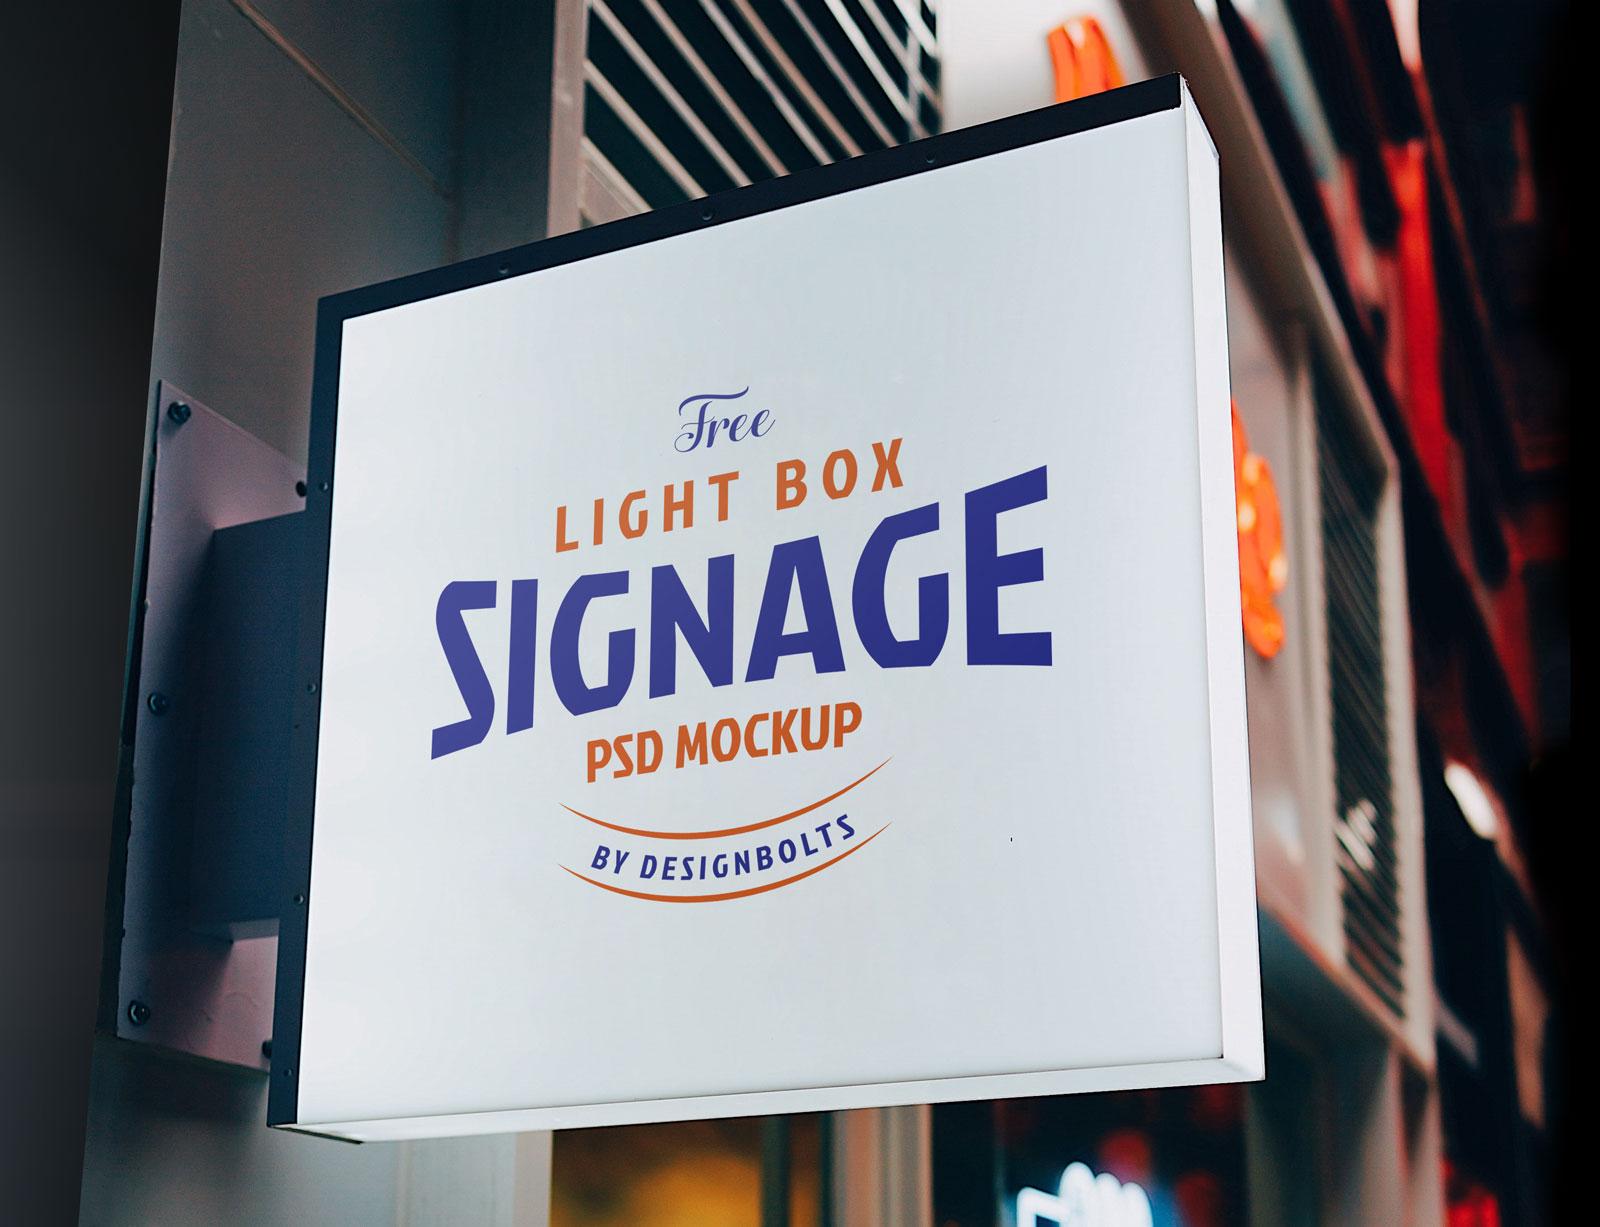 Free Light Box Signage Board Mockup